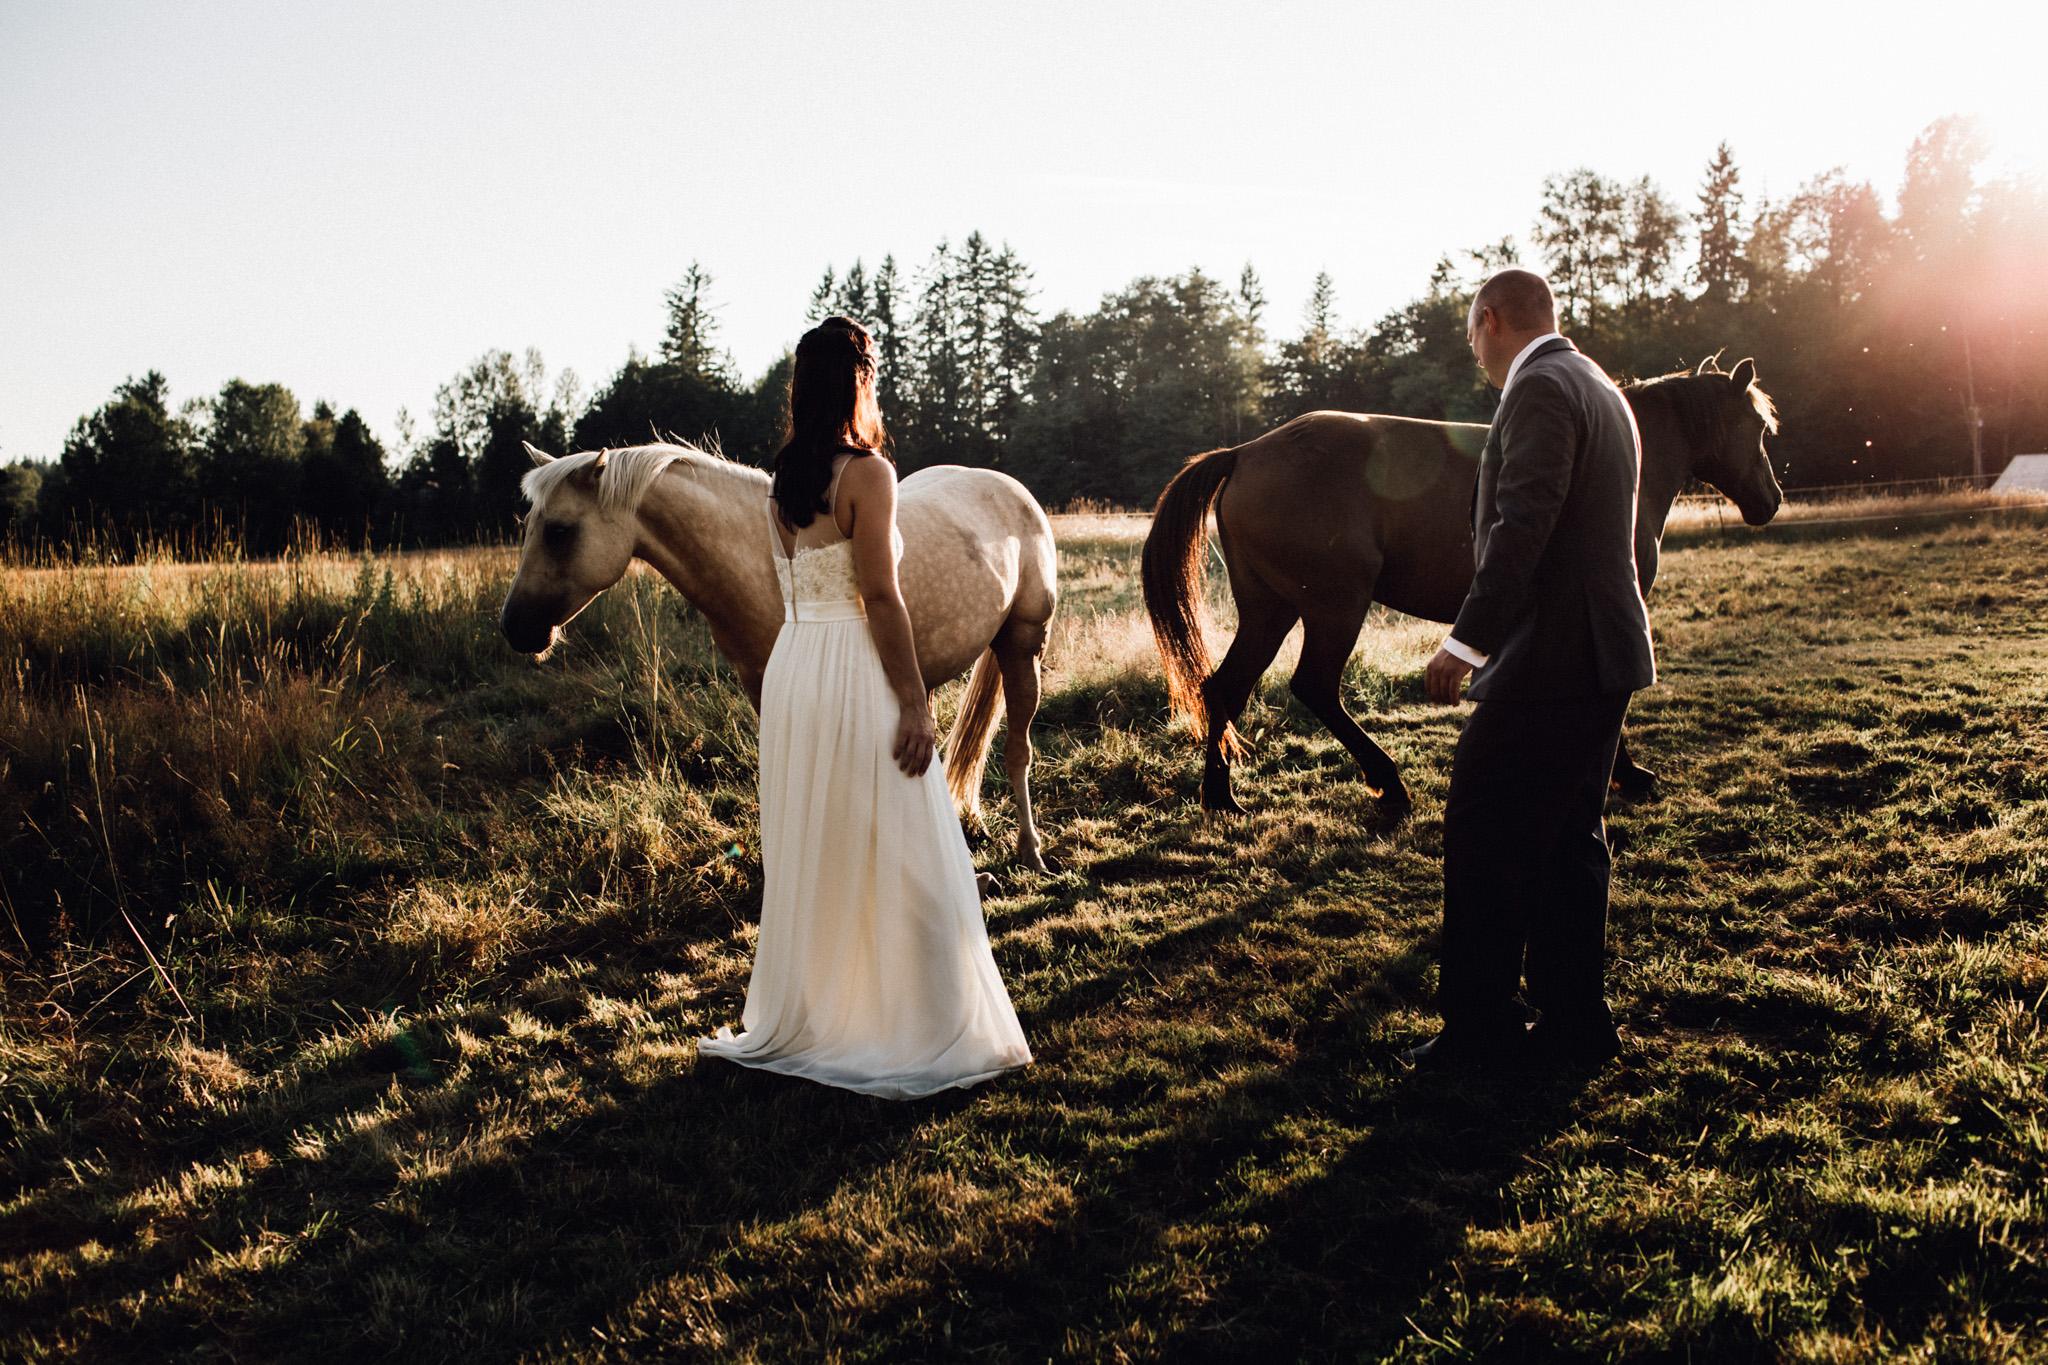 DannieMelissaWit_abeillephotography.com_mcinnis-153.jpg